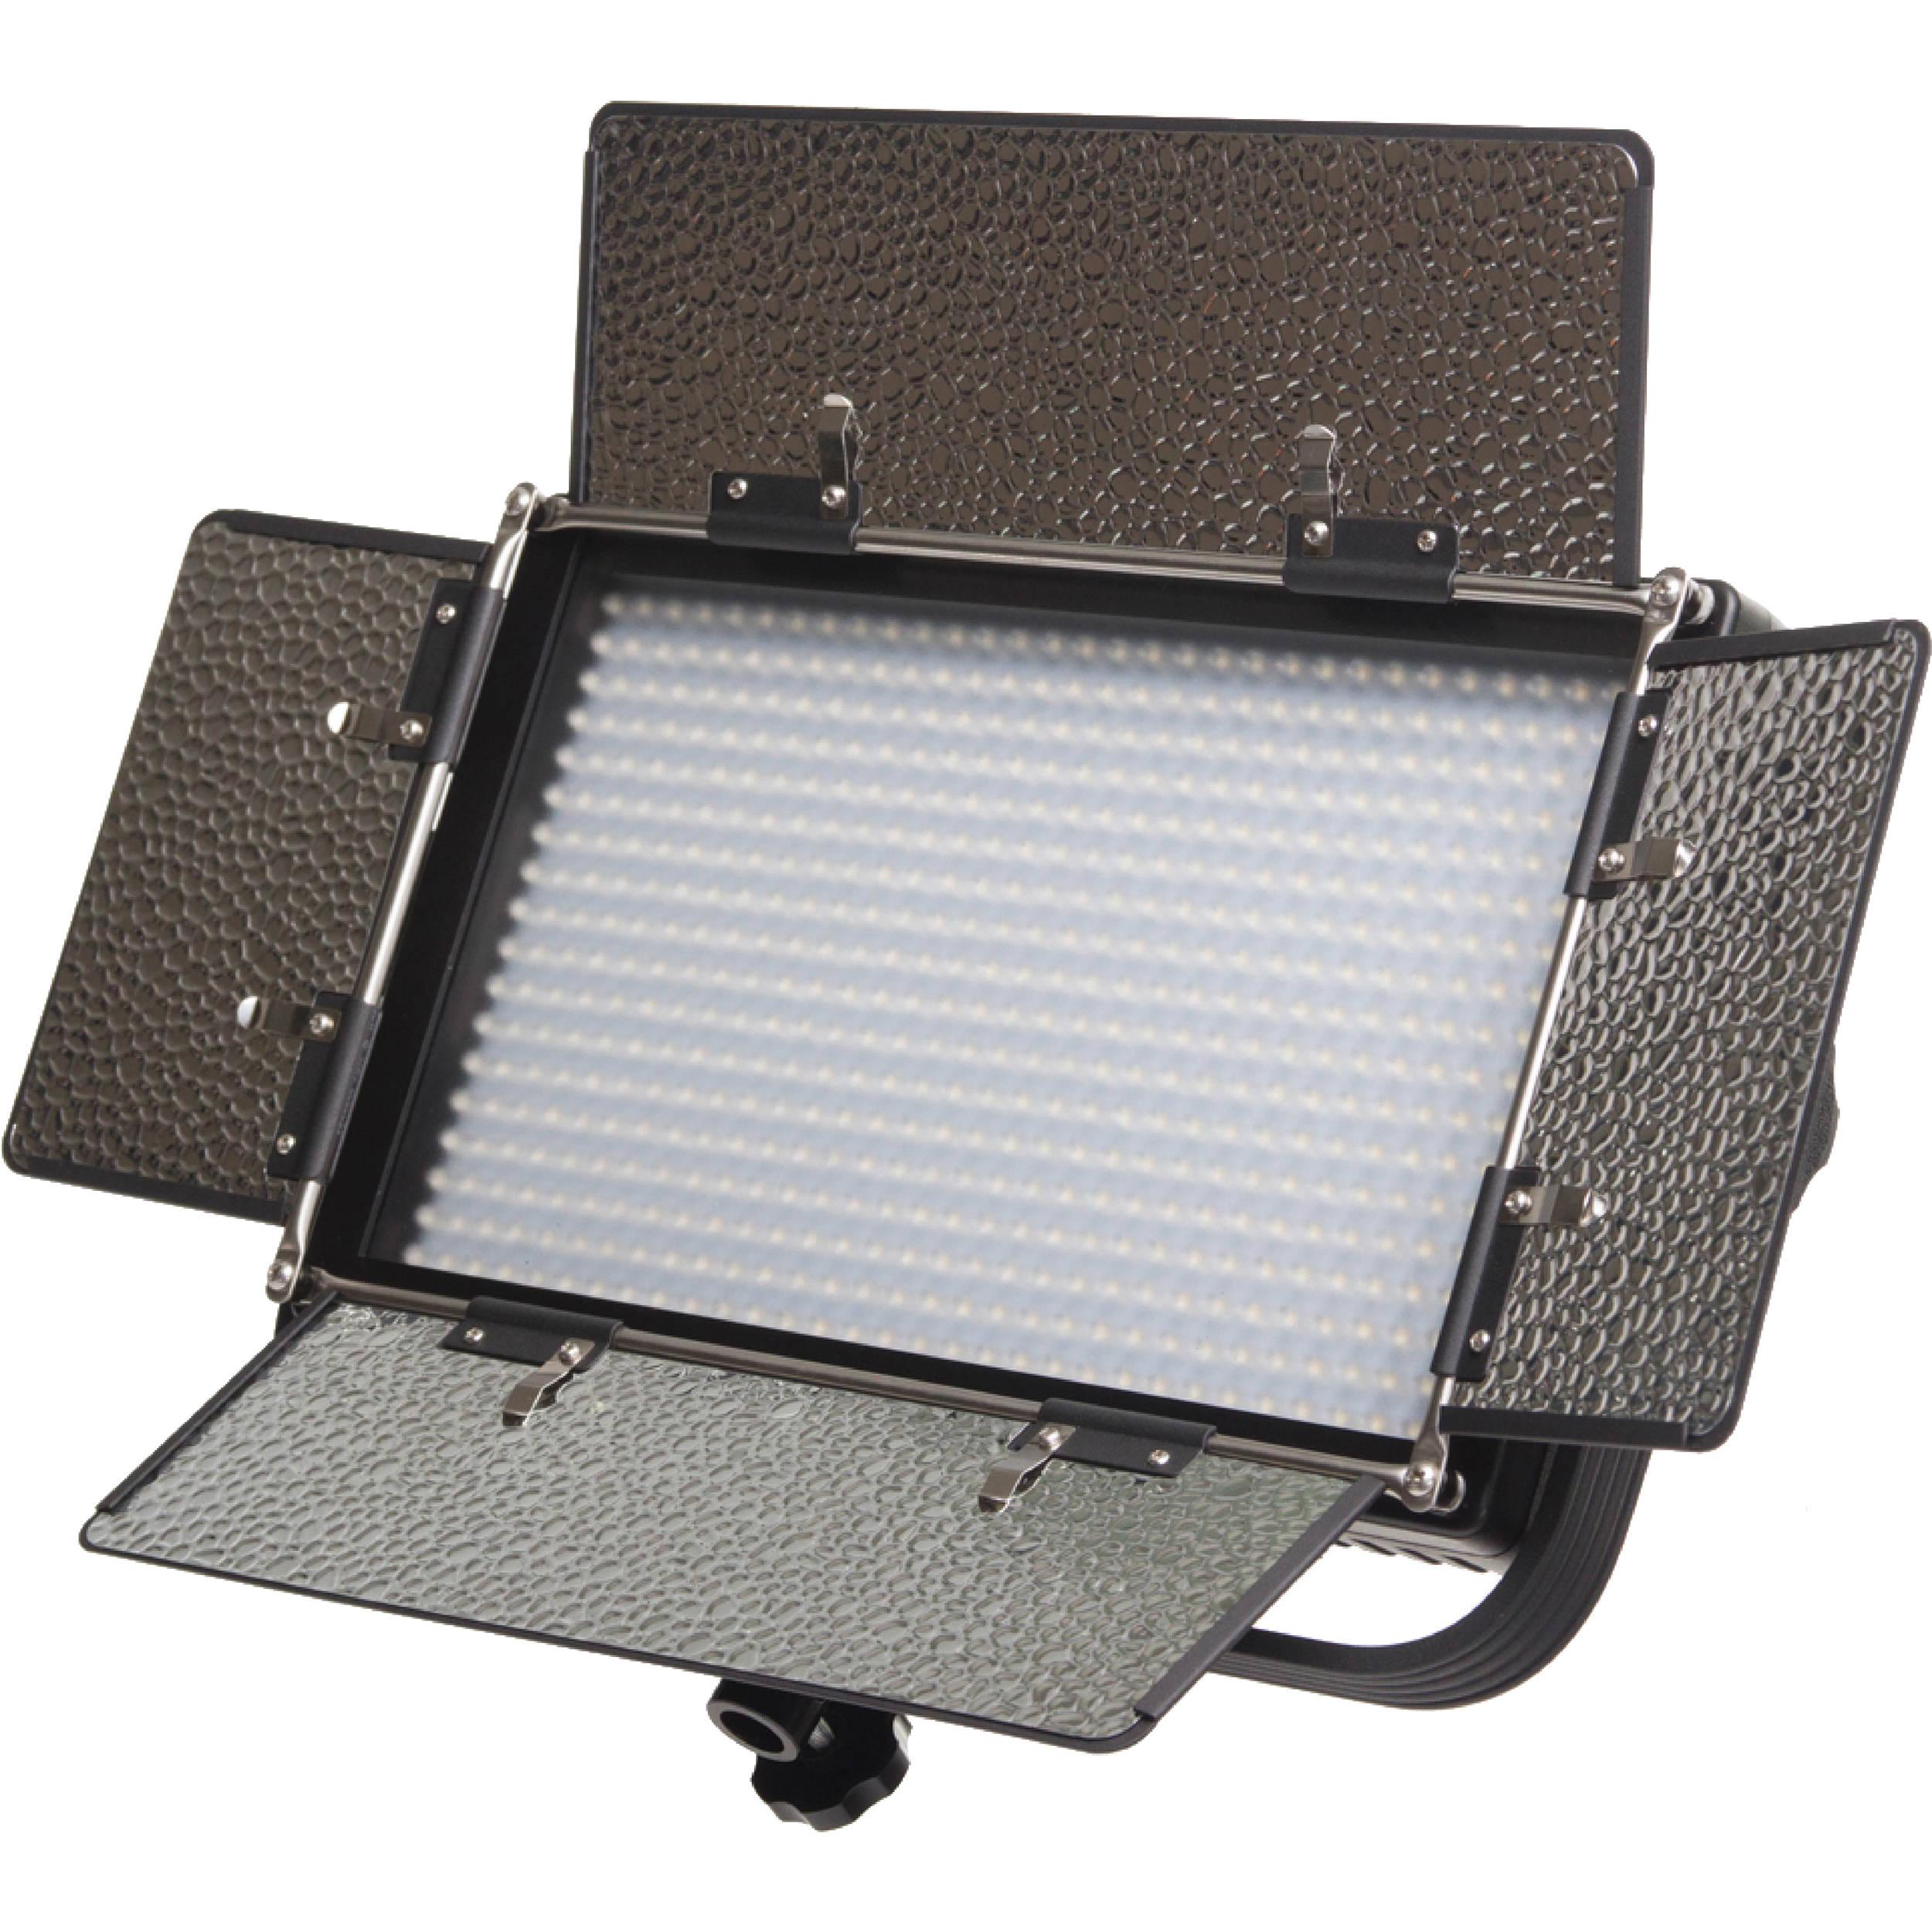 Ikan Ifd576 Sp Daylight Spot Led Light With Sony Ifd576 Sp